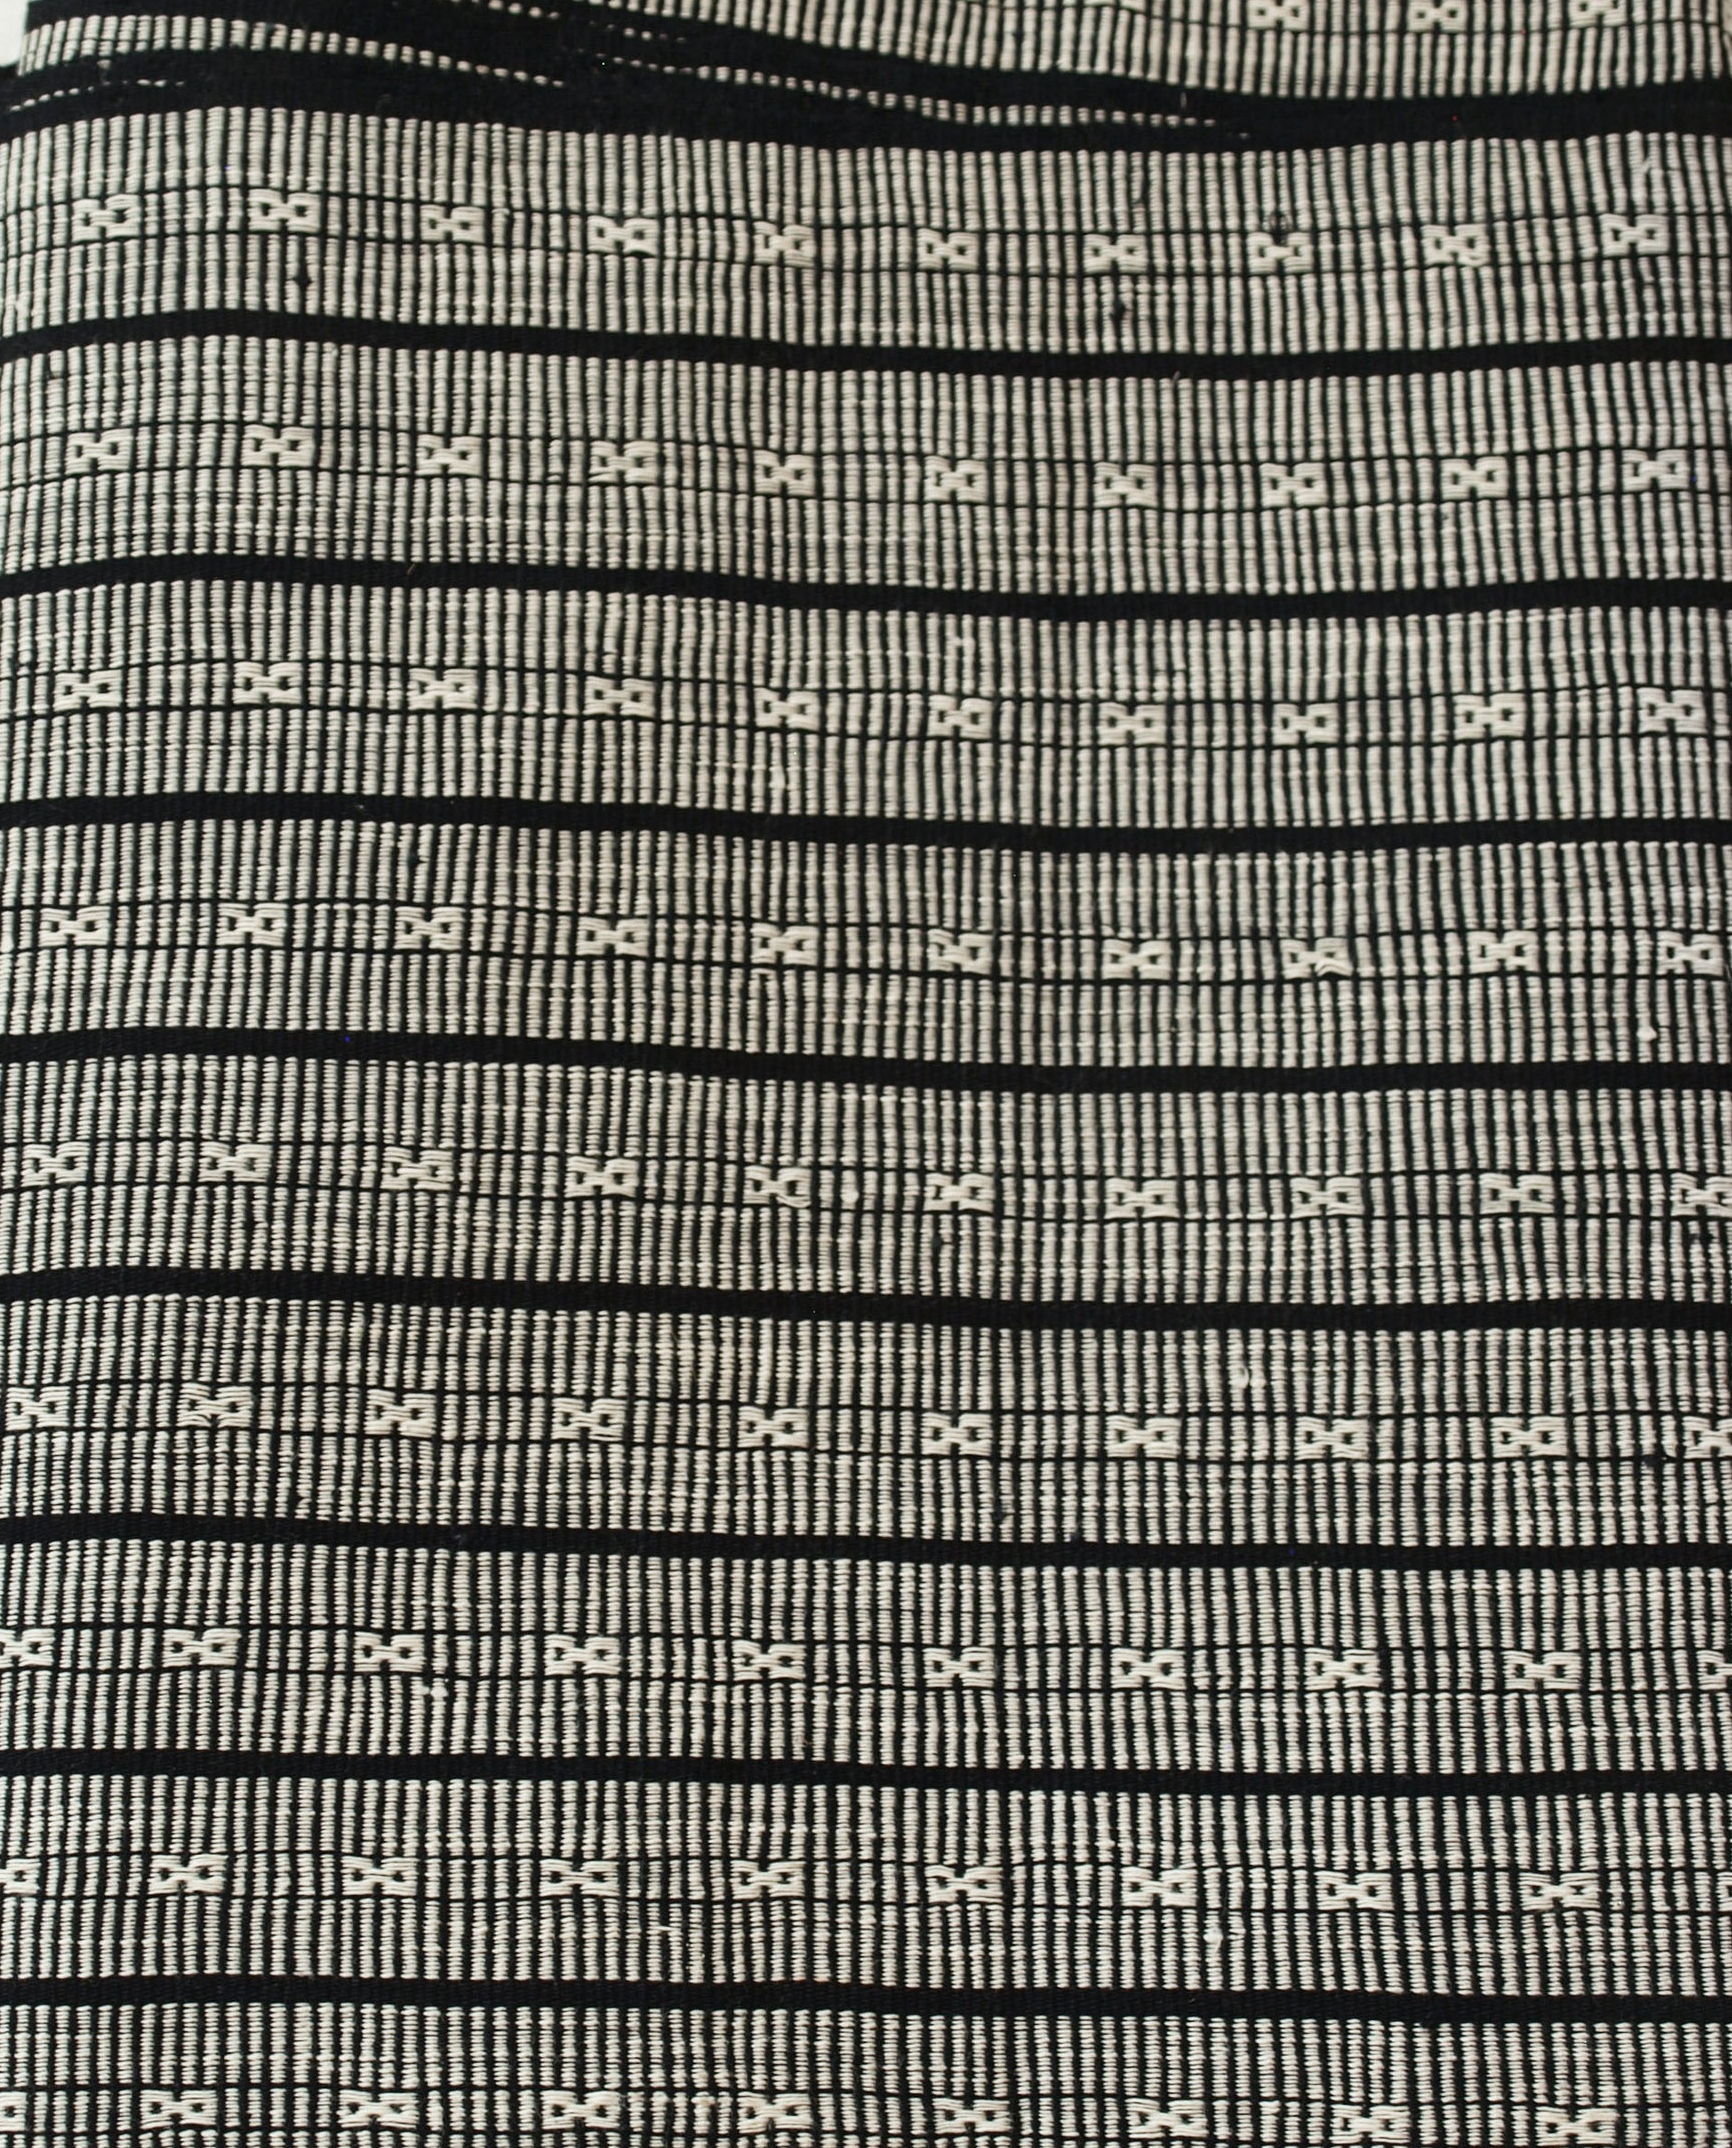 handa_textiles - 2 (1).jpg